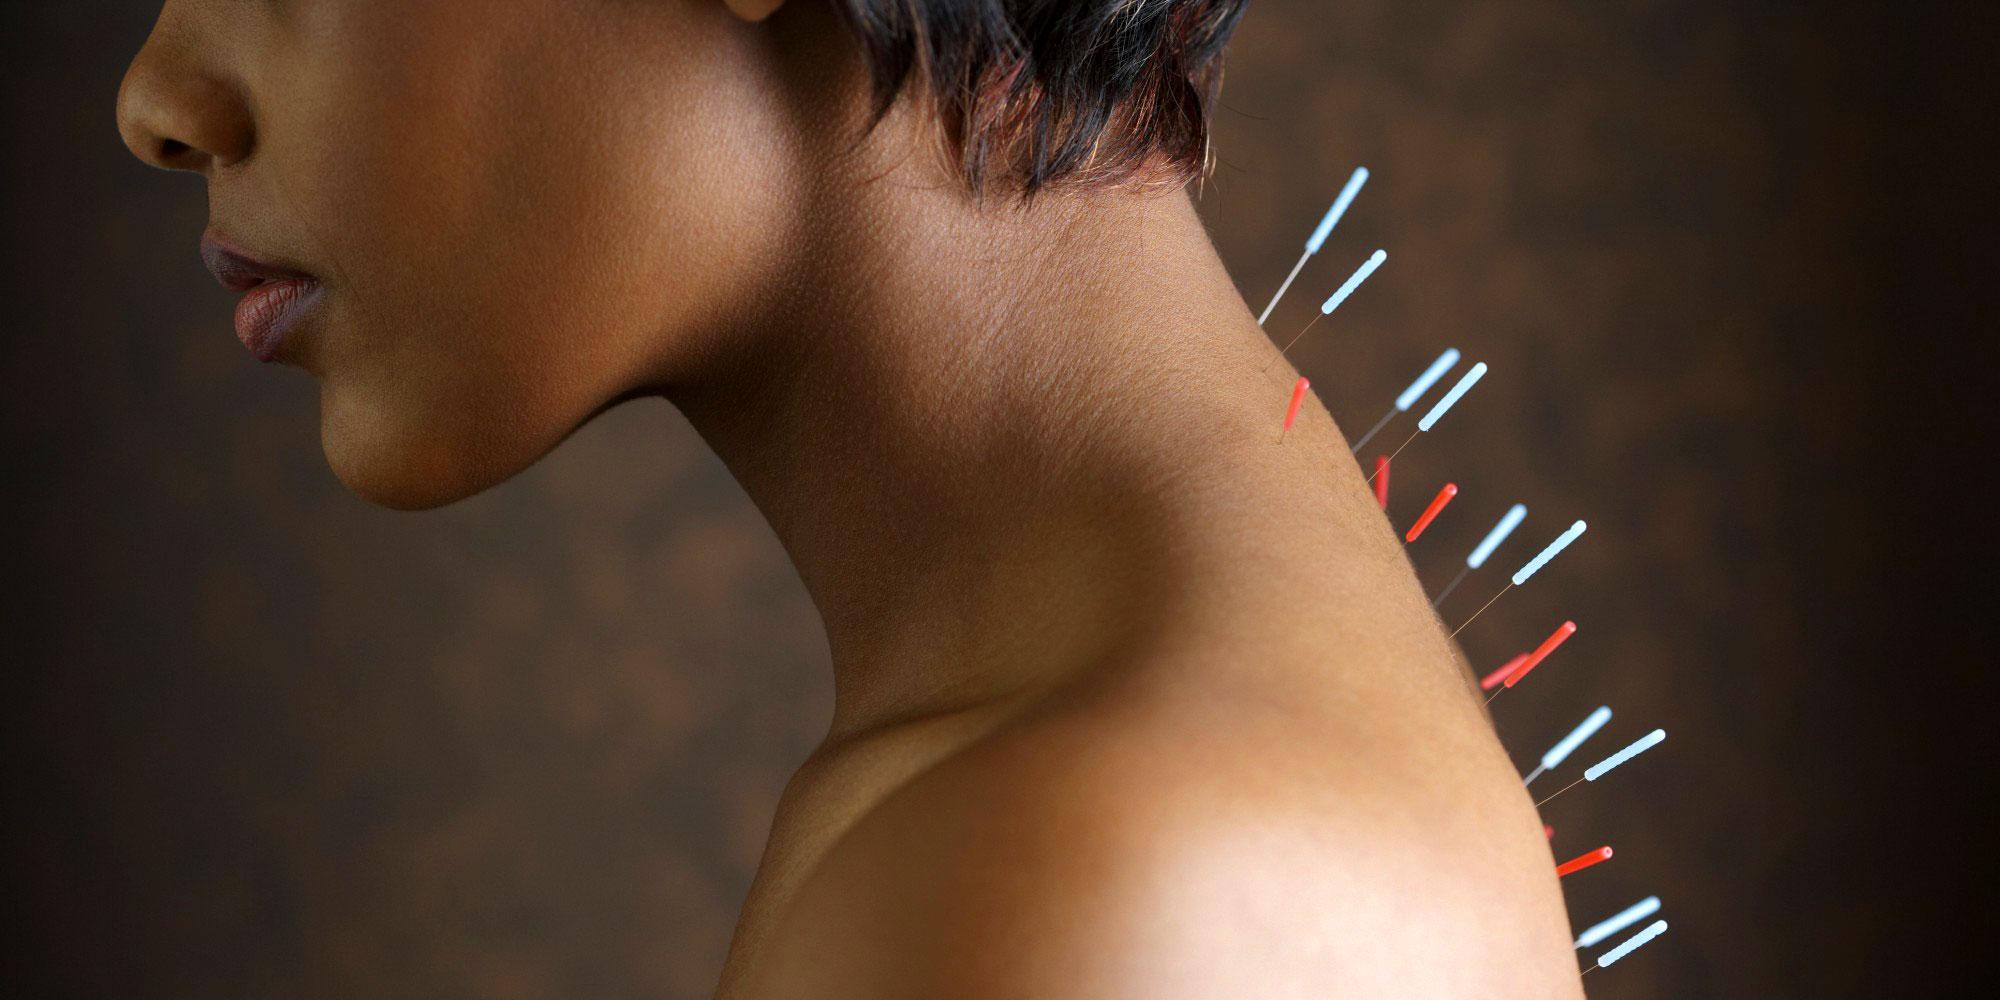 igloukalyvanie спины